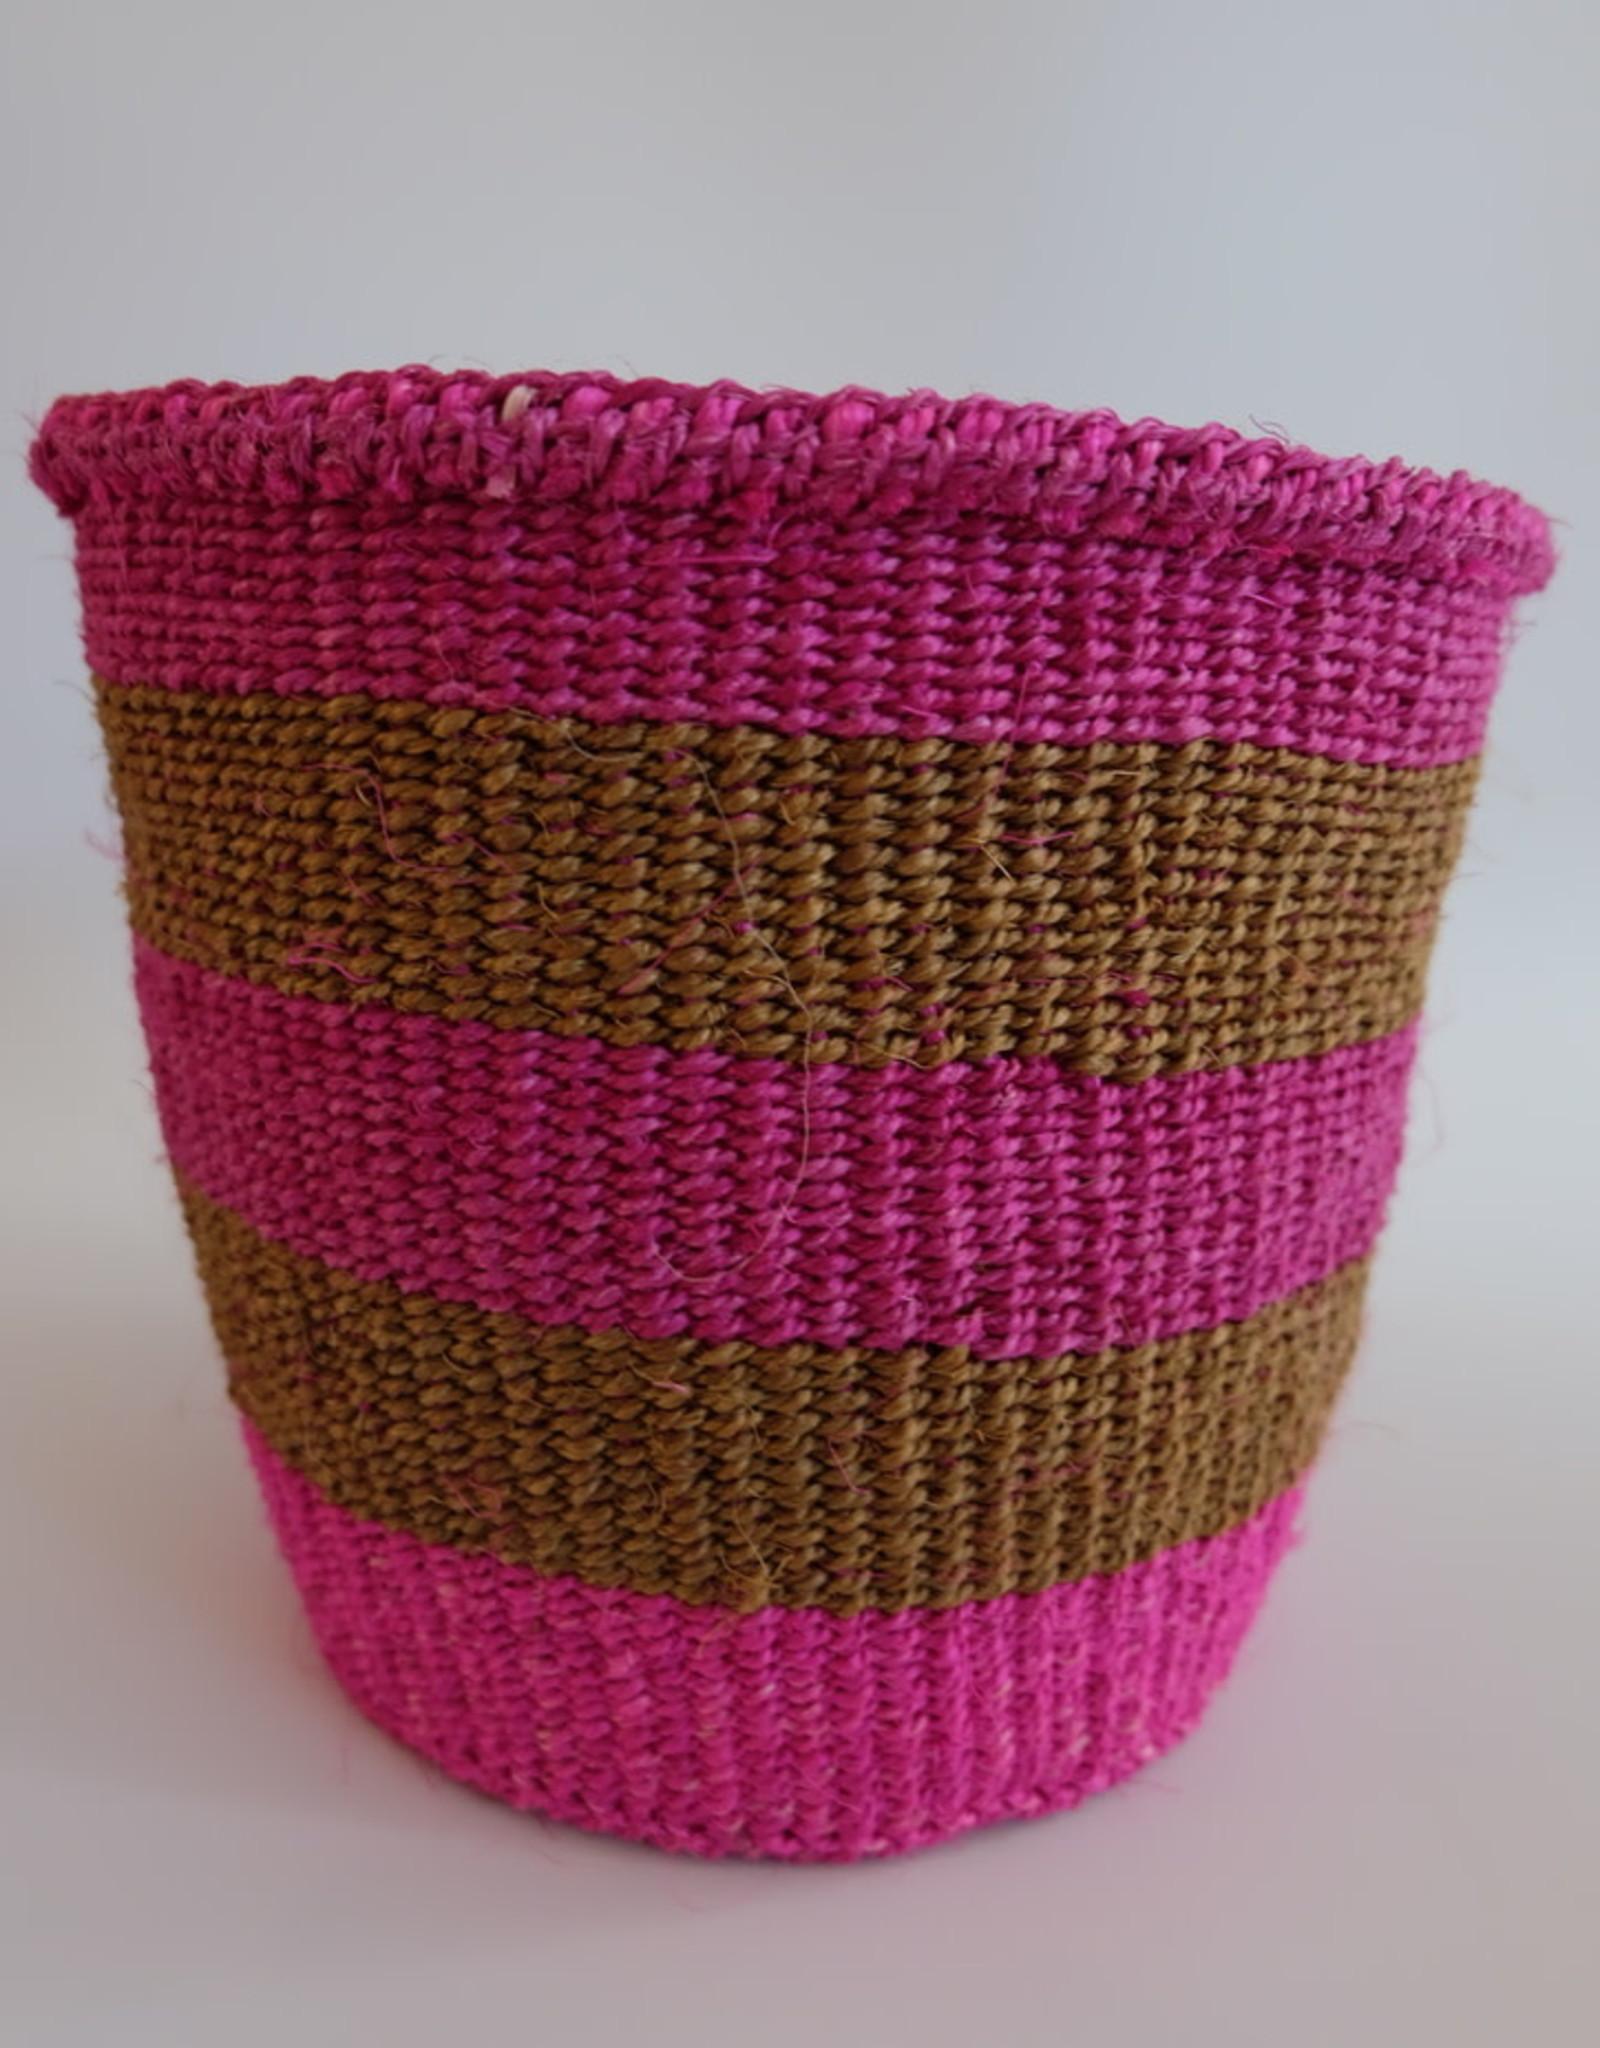 Solid Crafts Hadithi Basket S - pink & brown